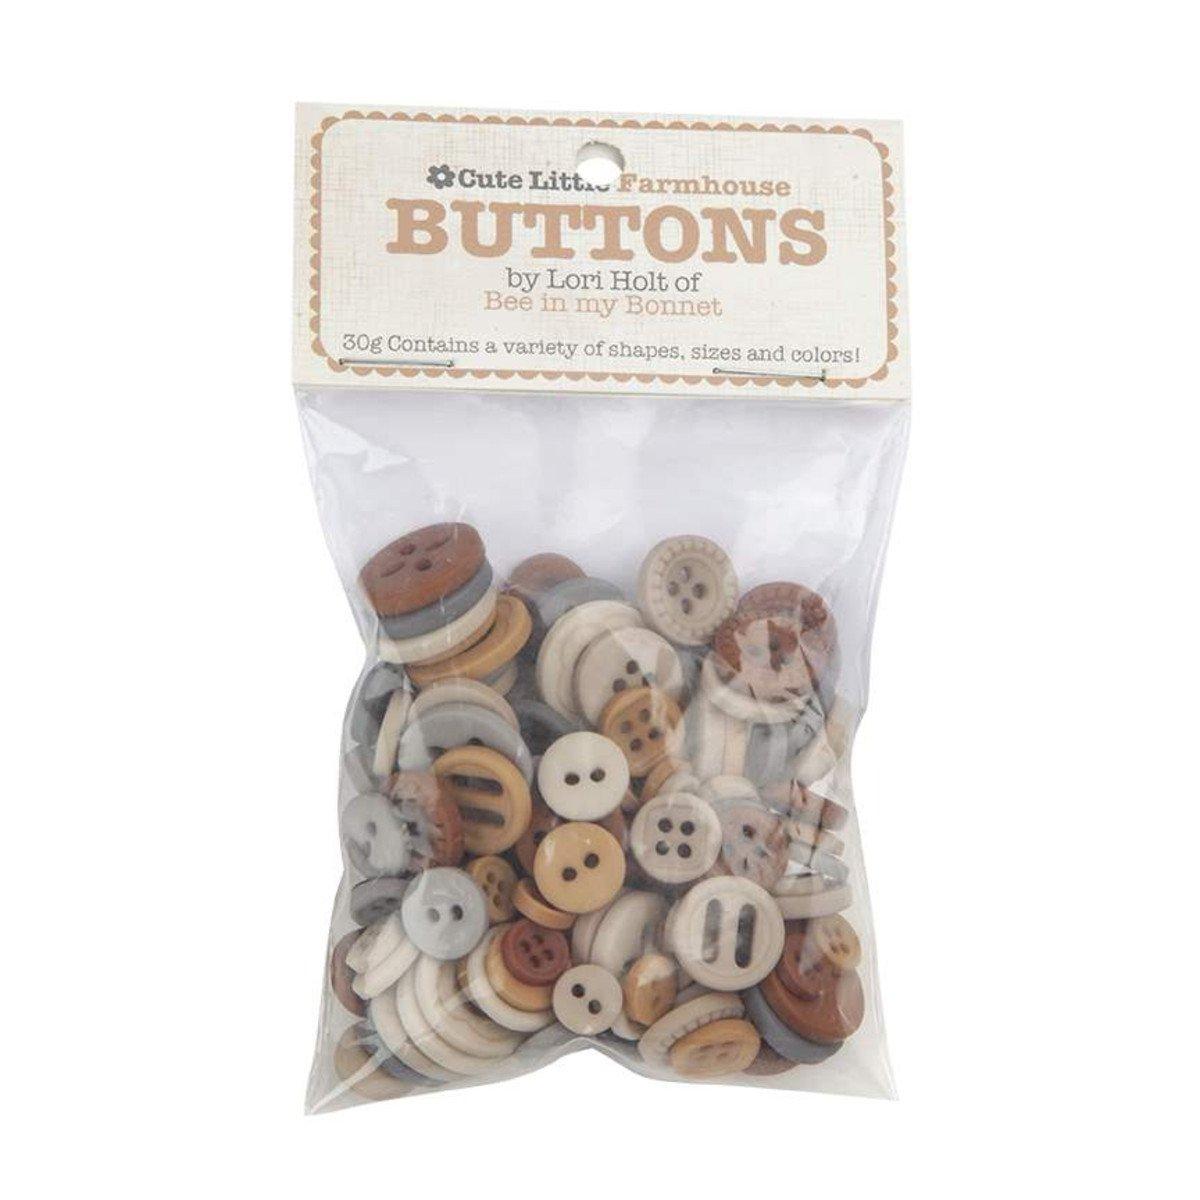 Cute Little Buttons Farmhouse